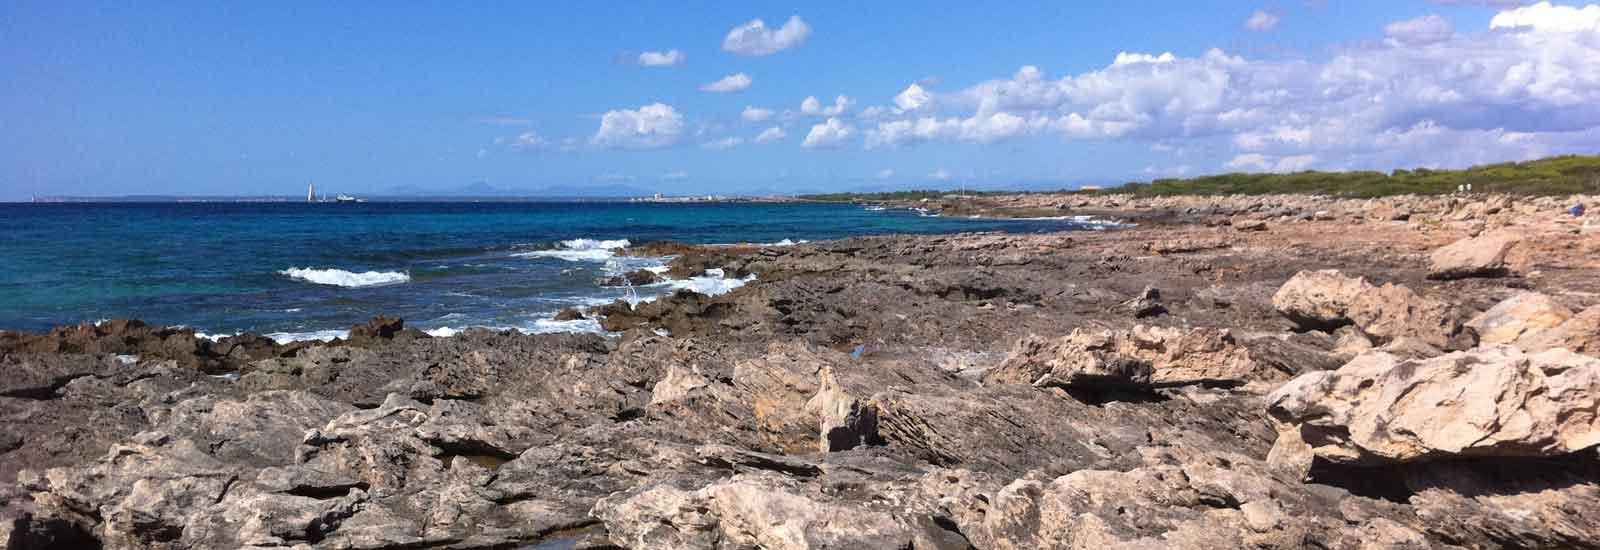 Tourismus Konzepte für Mallorca